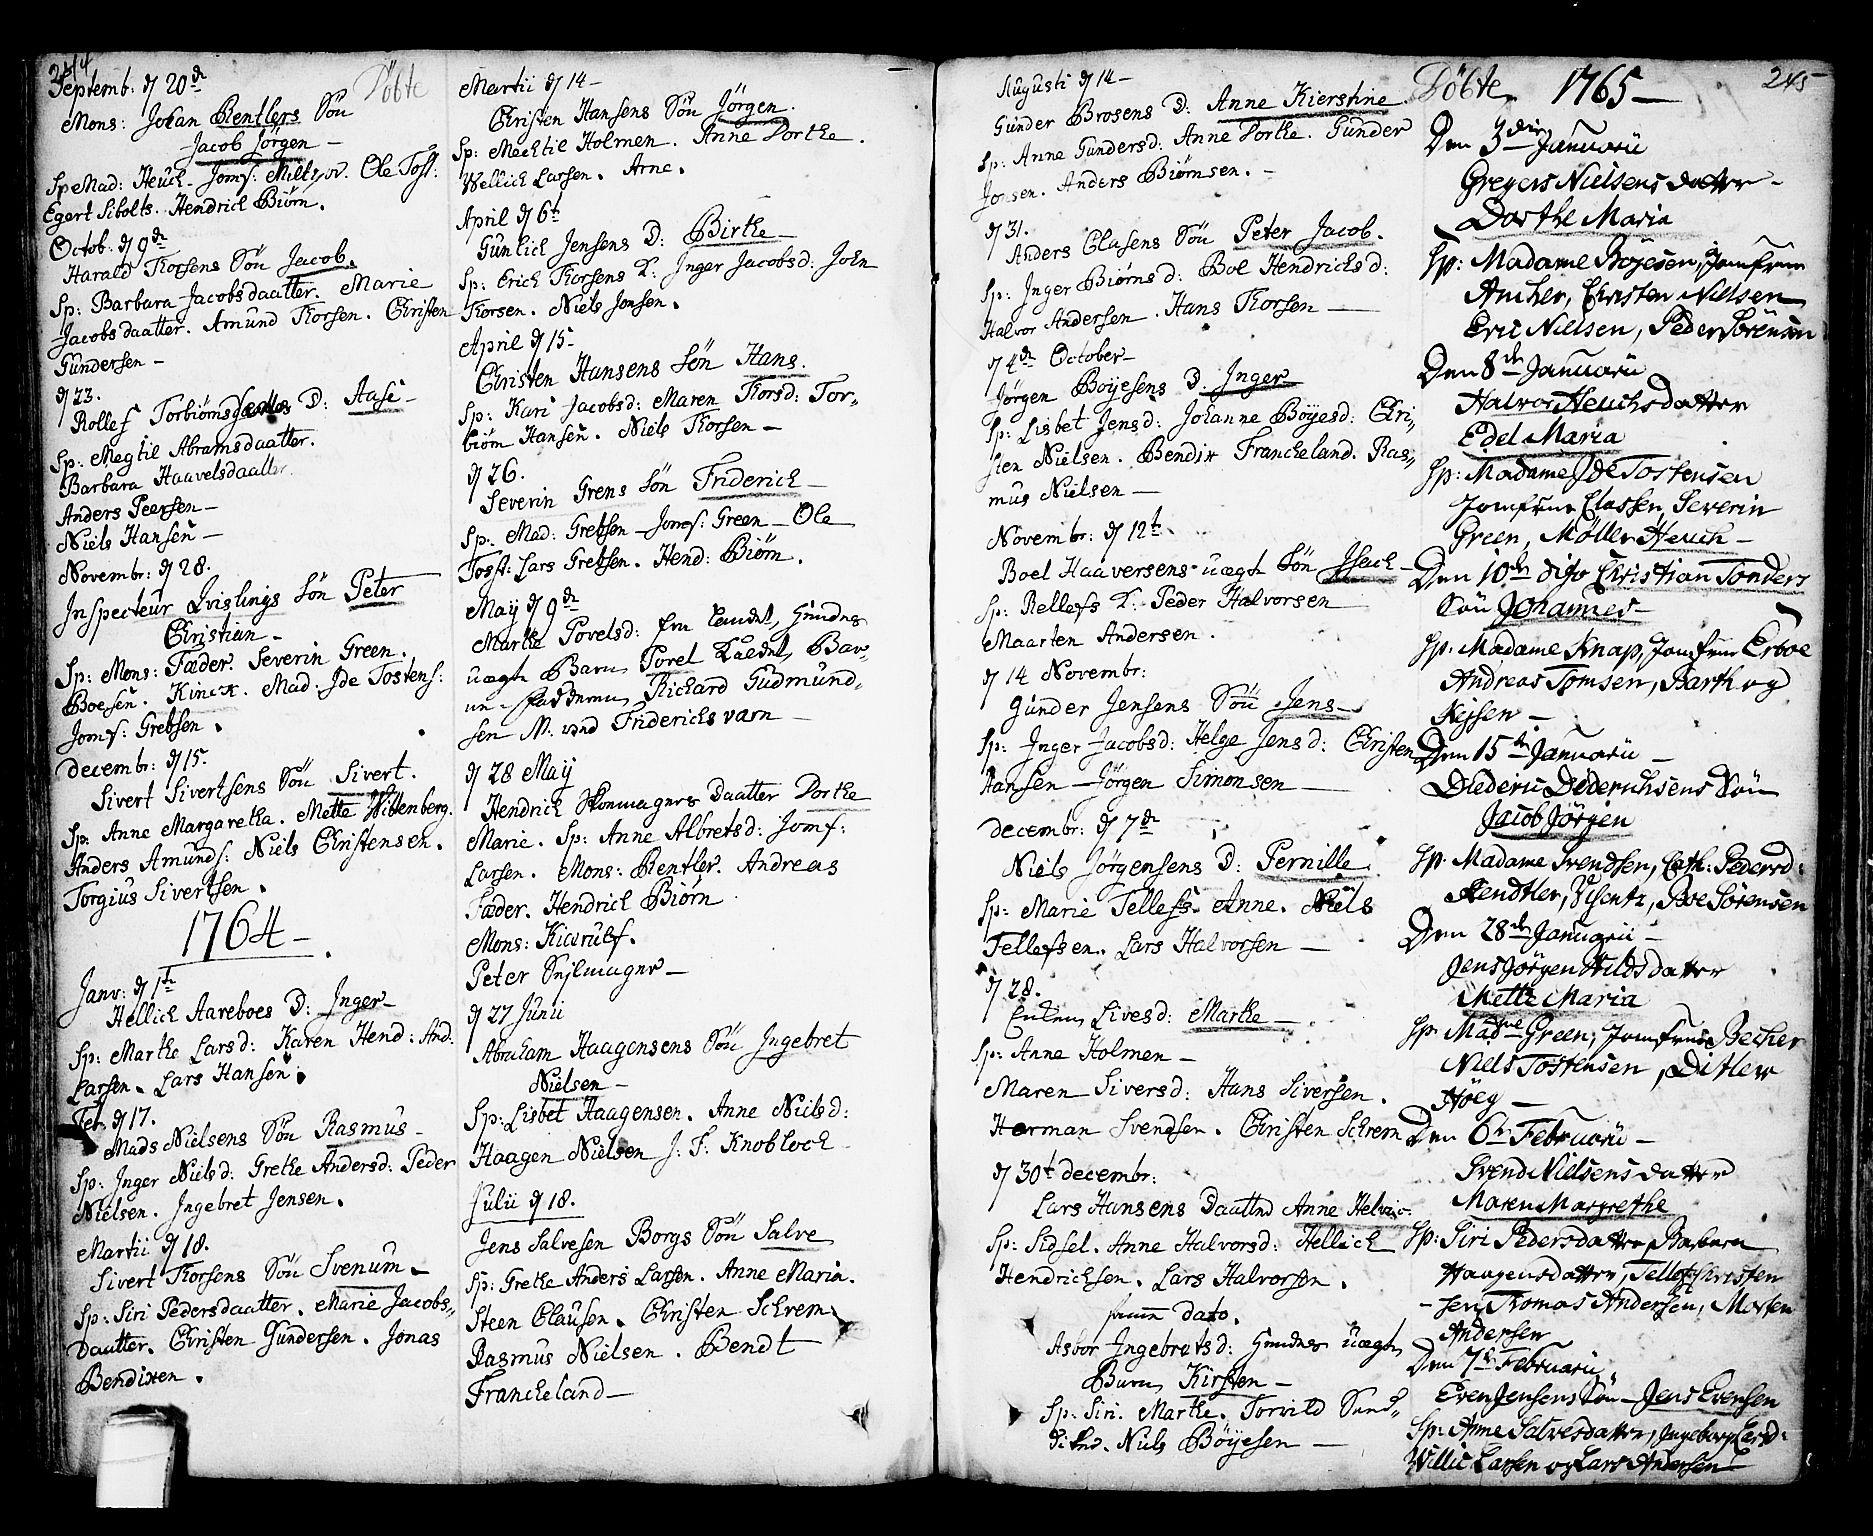 SAKO, Kragerø kirkebøker, F/Fa/L0001: Ministerialbok nr. 1, 1702-1766, s. 244-245